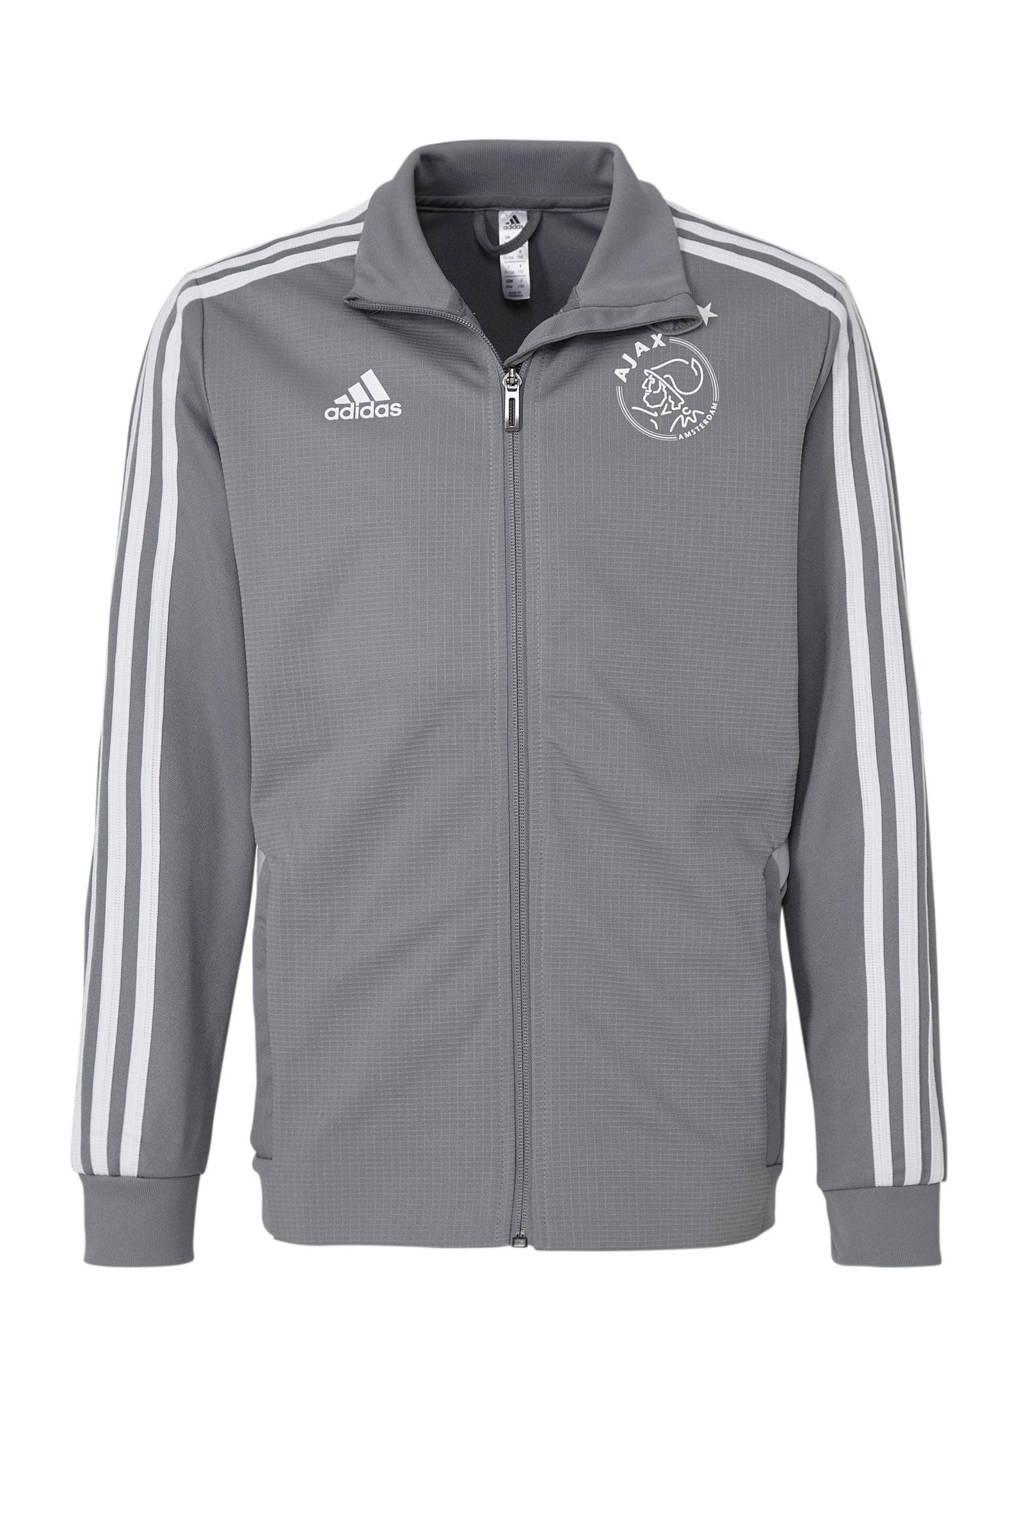 adidas Junior Ajax voetbaljack Training, Jongens/meisjes